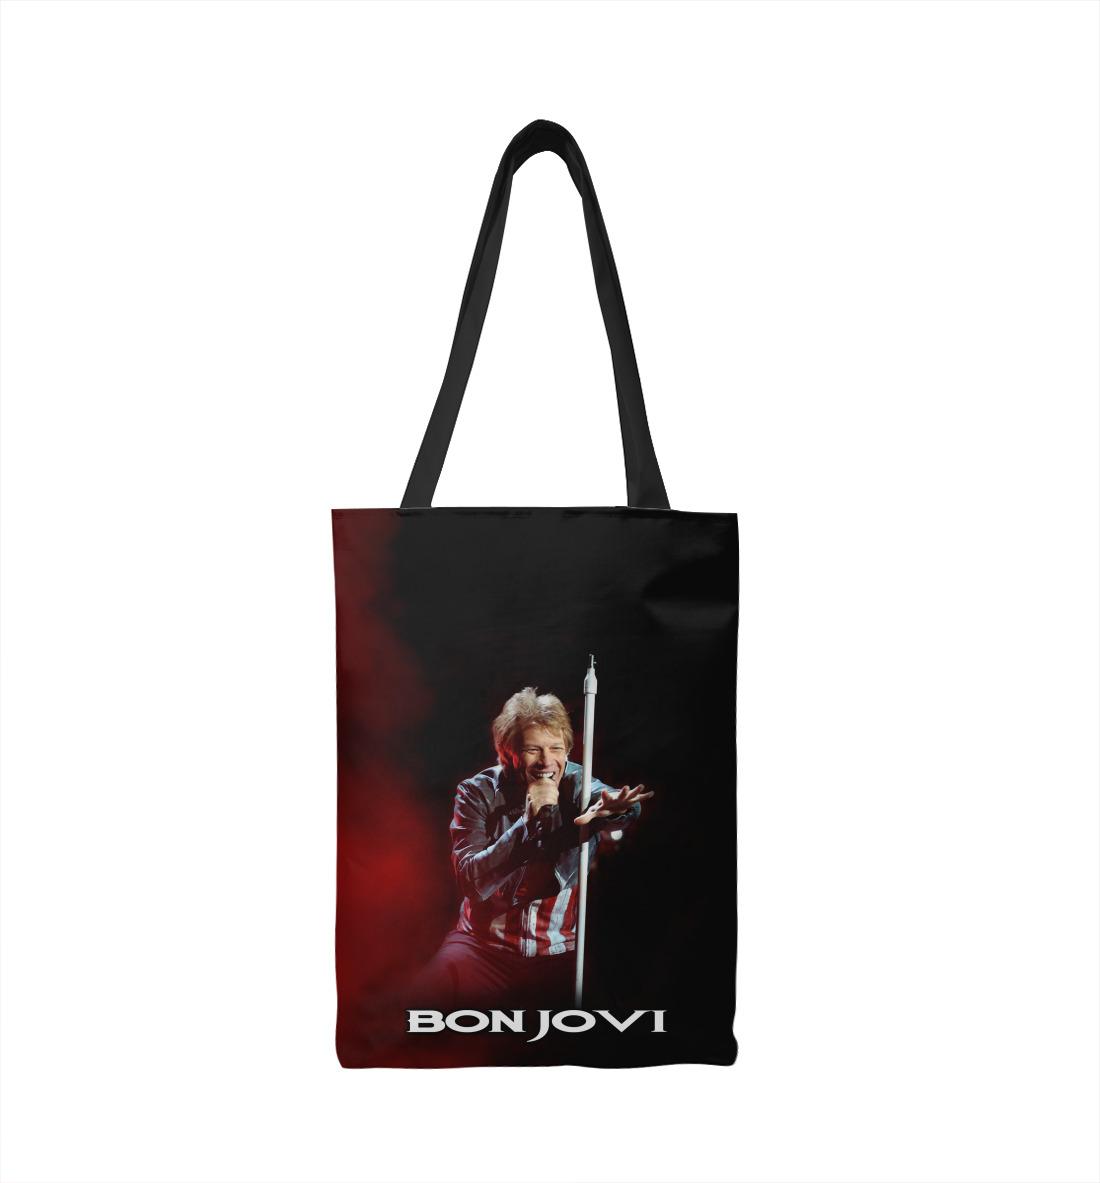 Bon Jovi hannelore gottschalk bon courage